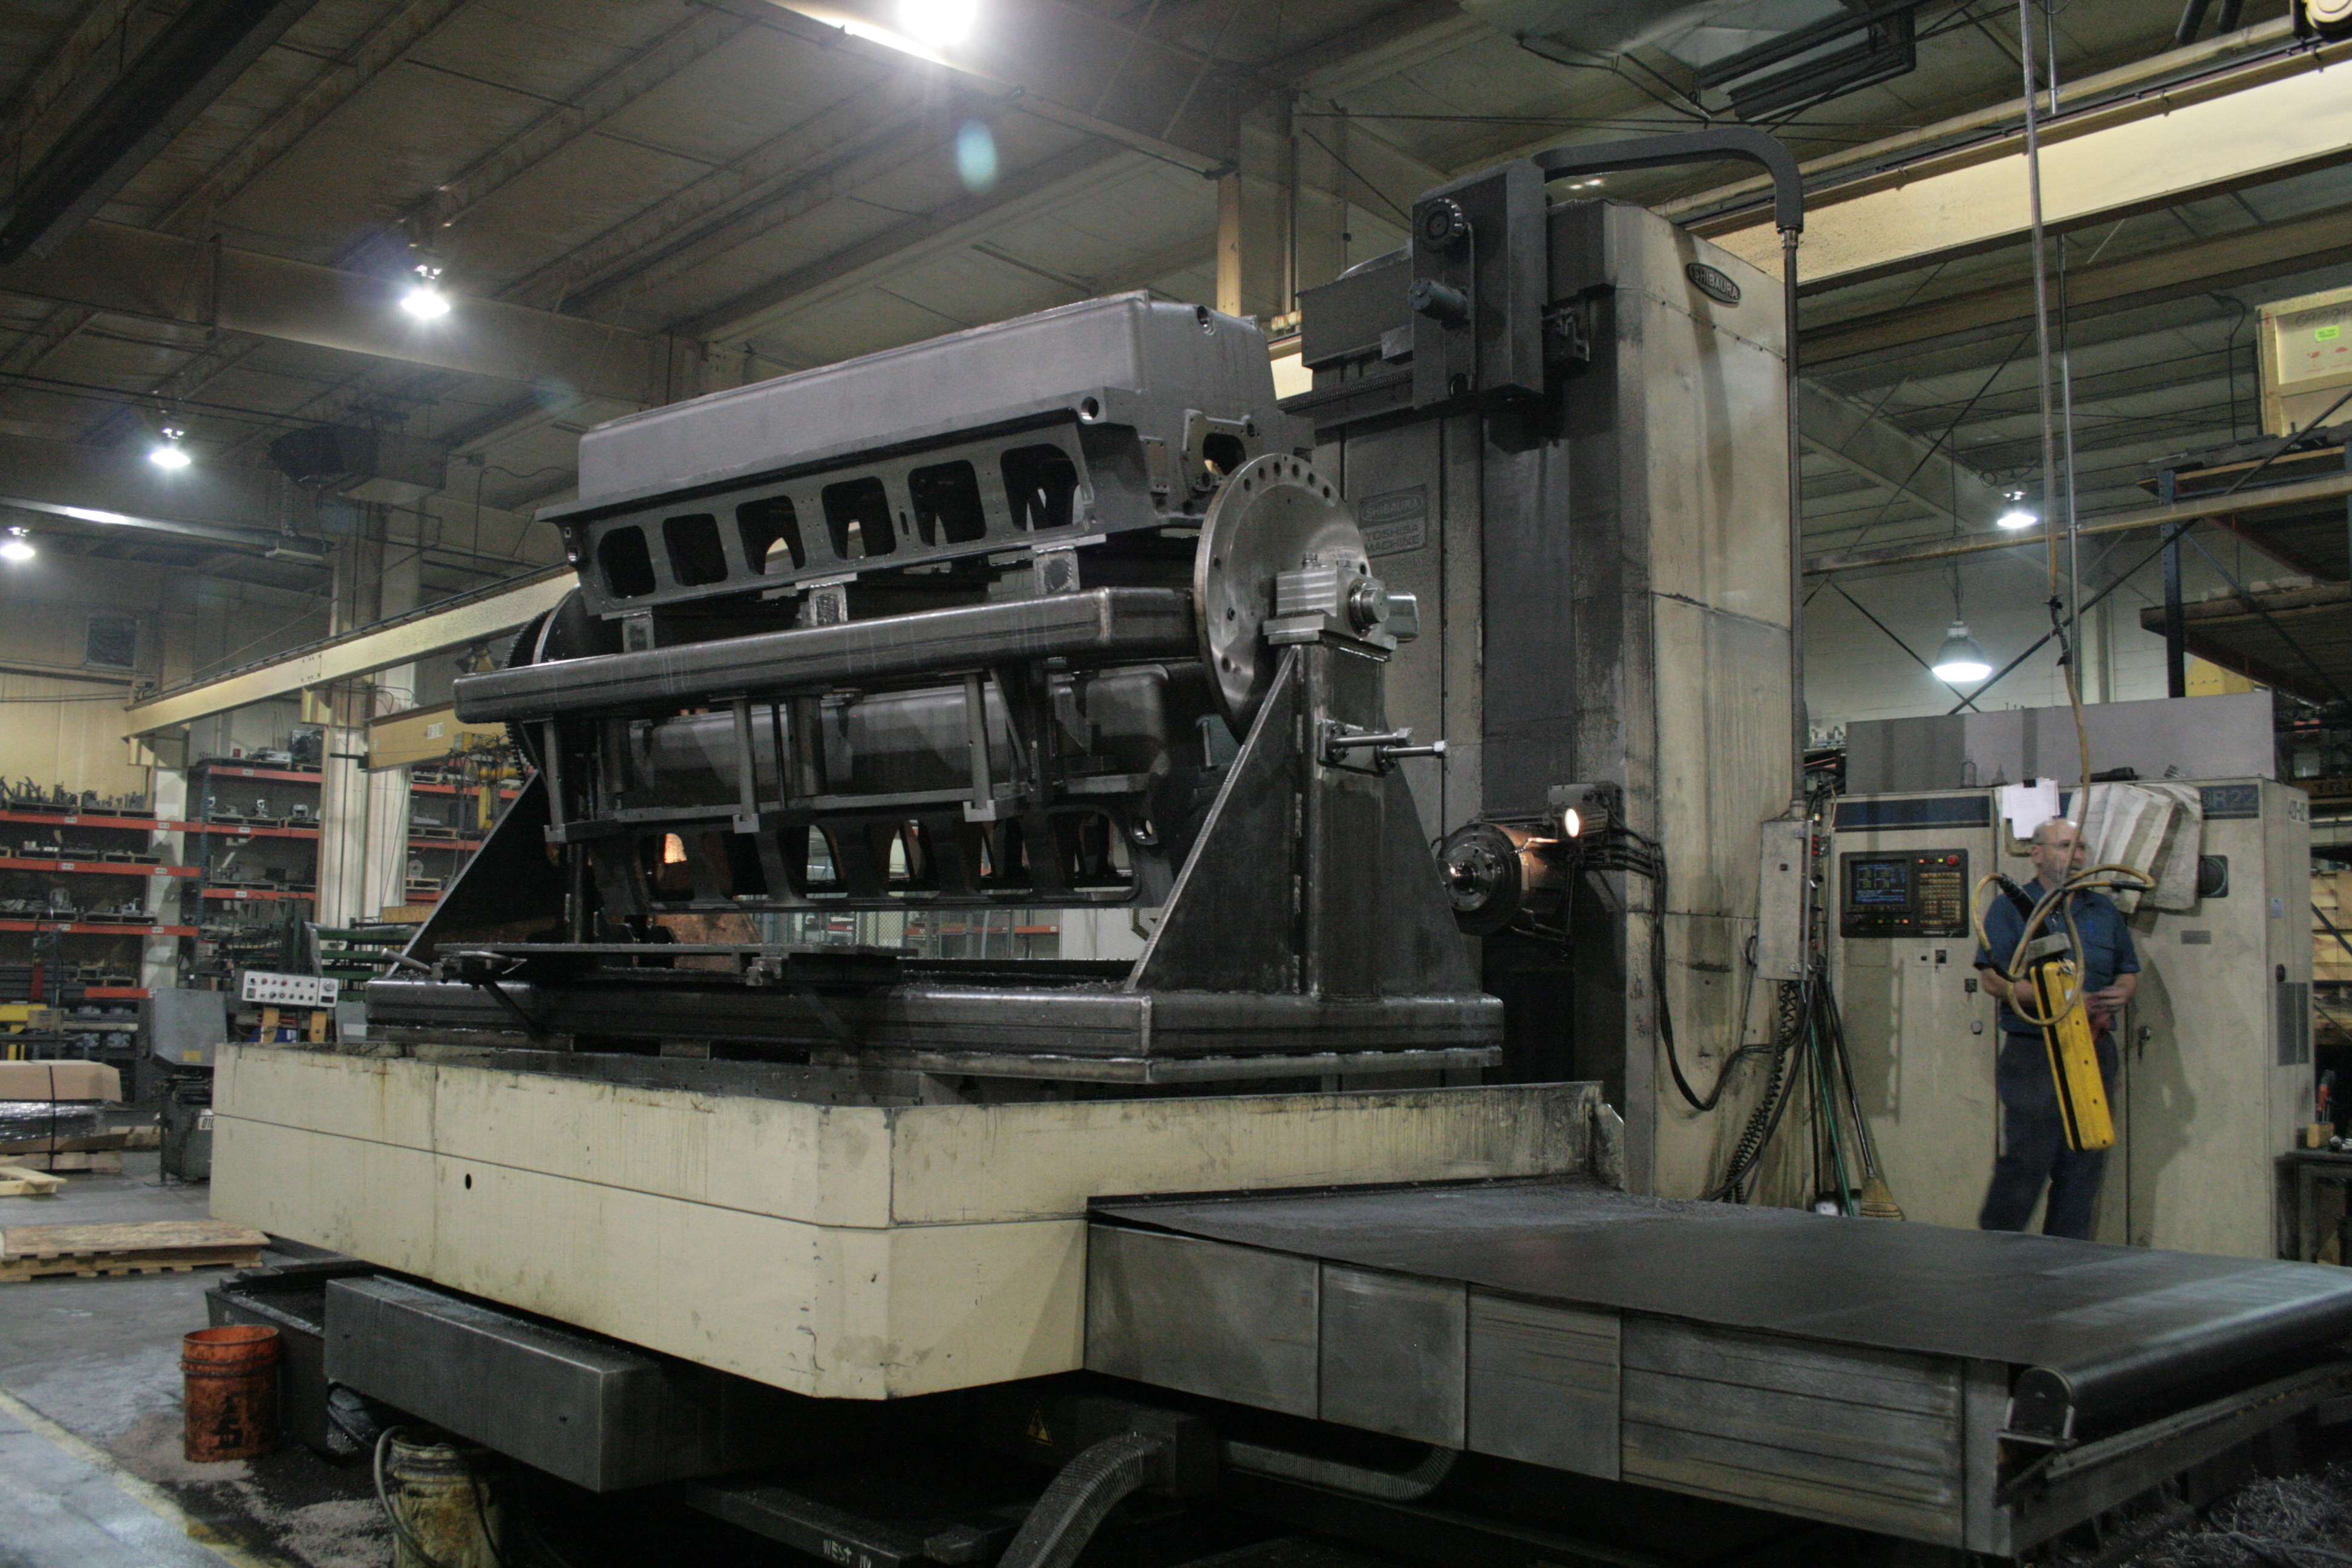 Manitowoc Tool & Machining,MTM,CNC Machining, Precision Machining, Job shop, production machining, assembly, tooling,custom fabrications,engineering,mantool.com